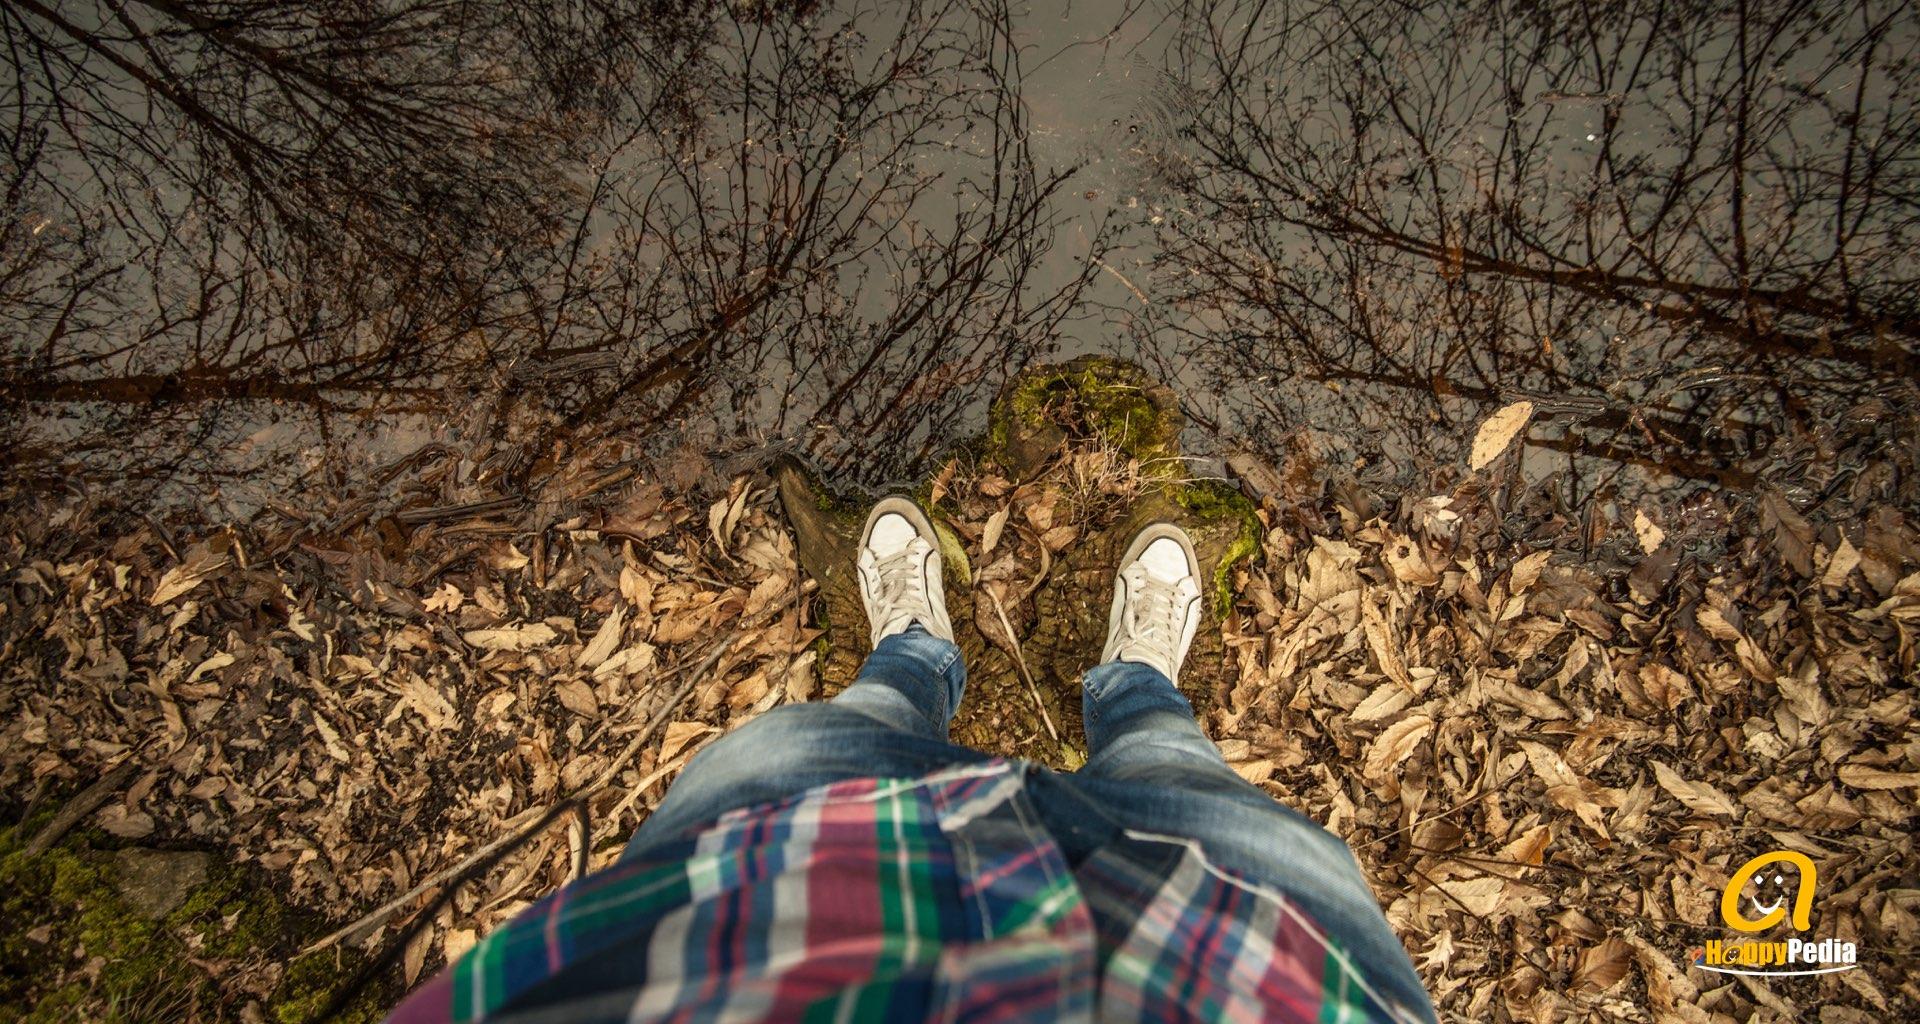 blog - feed man woman forest autumn.jpeg